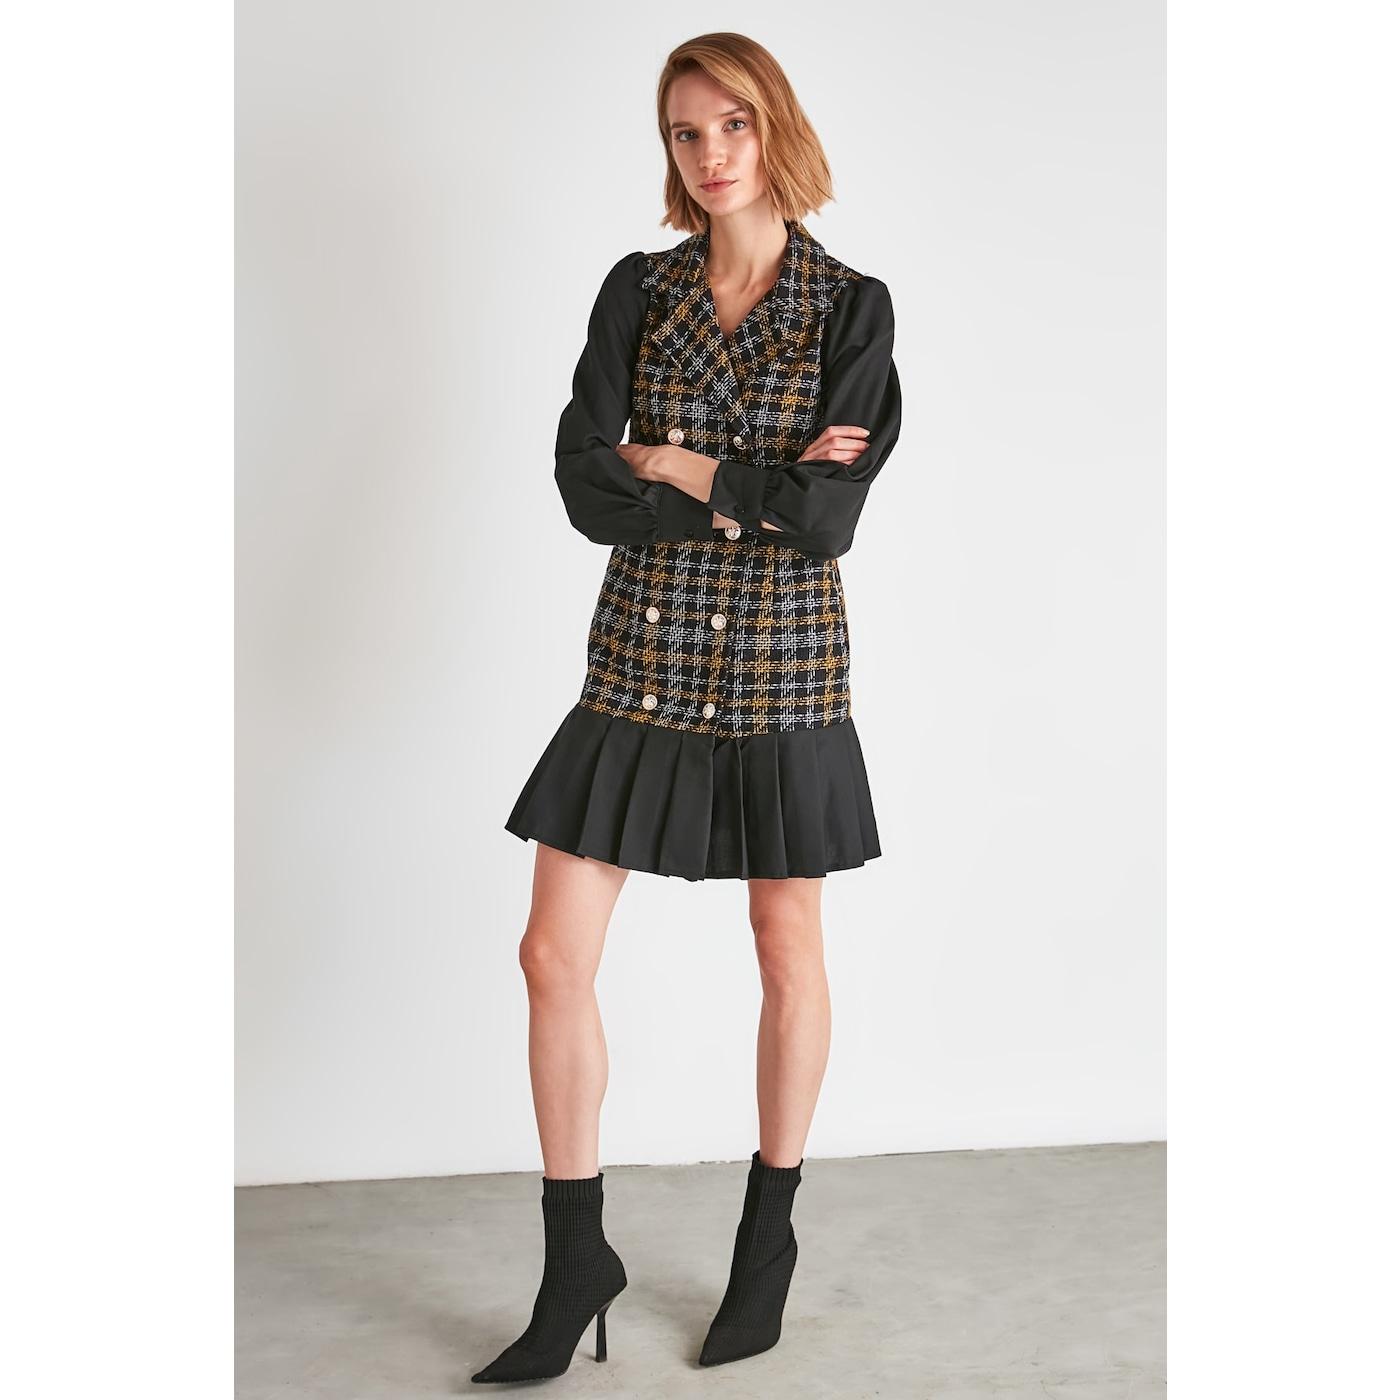 Trendyol Multicolored Tweed Jacket Dress dámské 34